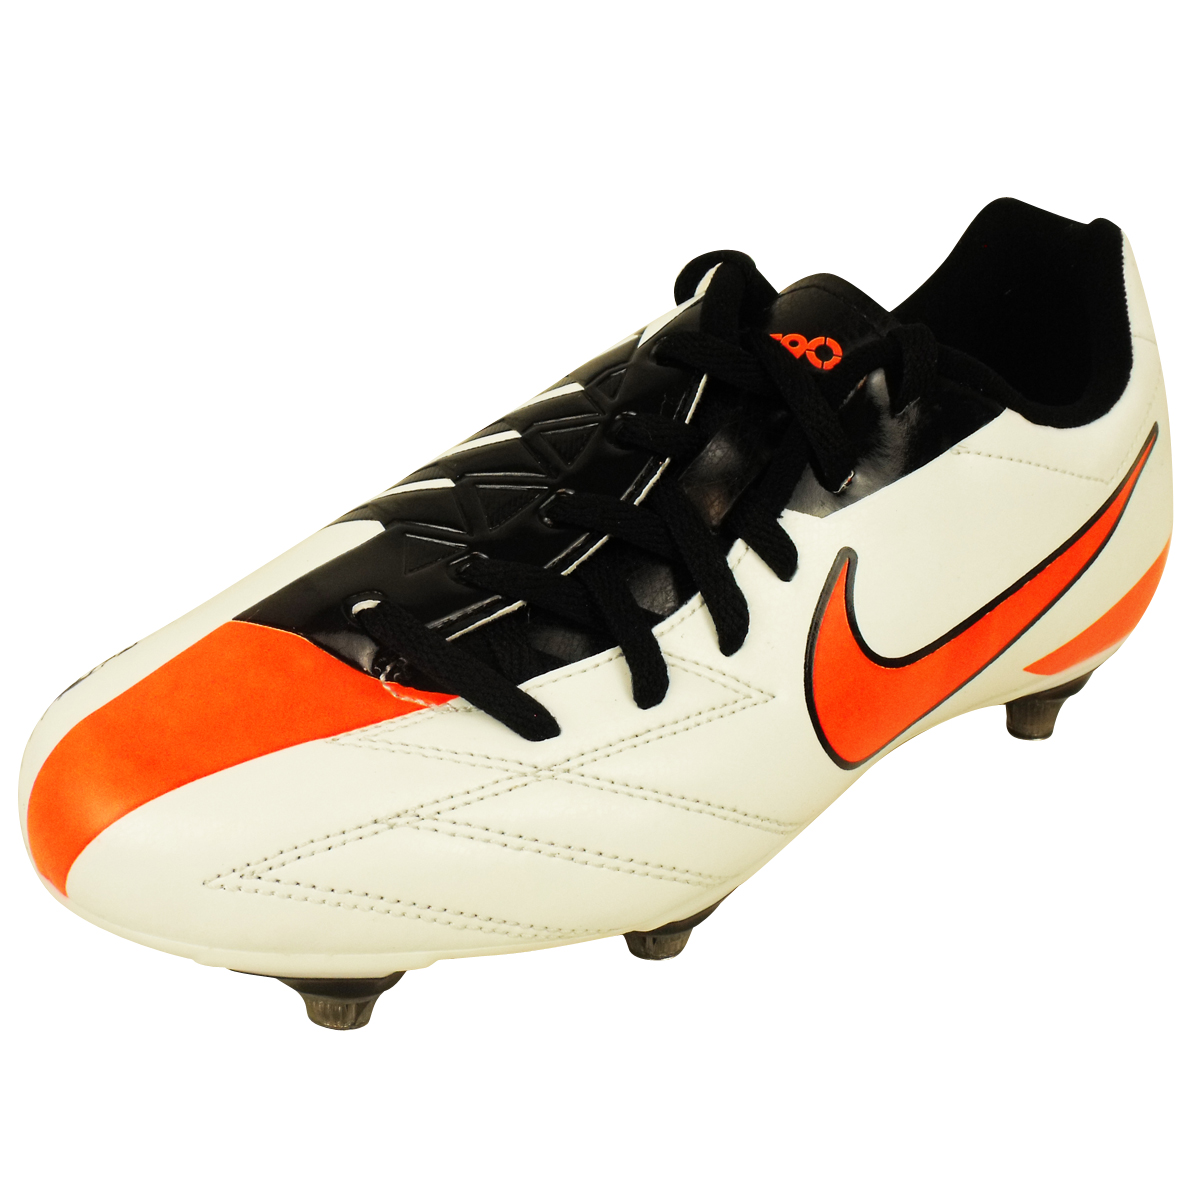 ea7de1d4f9e Boys Nike Total 90 SG Soft Ground Football Boots Junior Sizes Kids Size UK  10-6